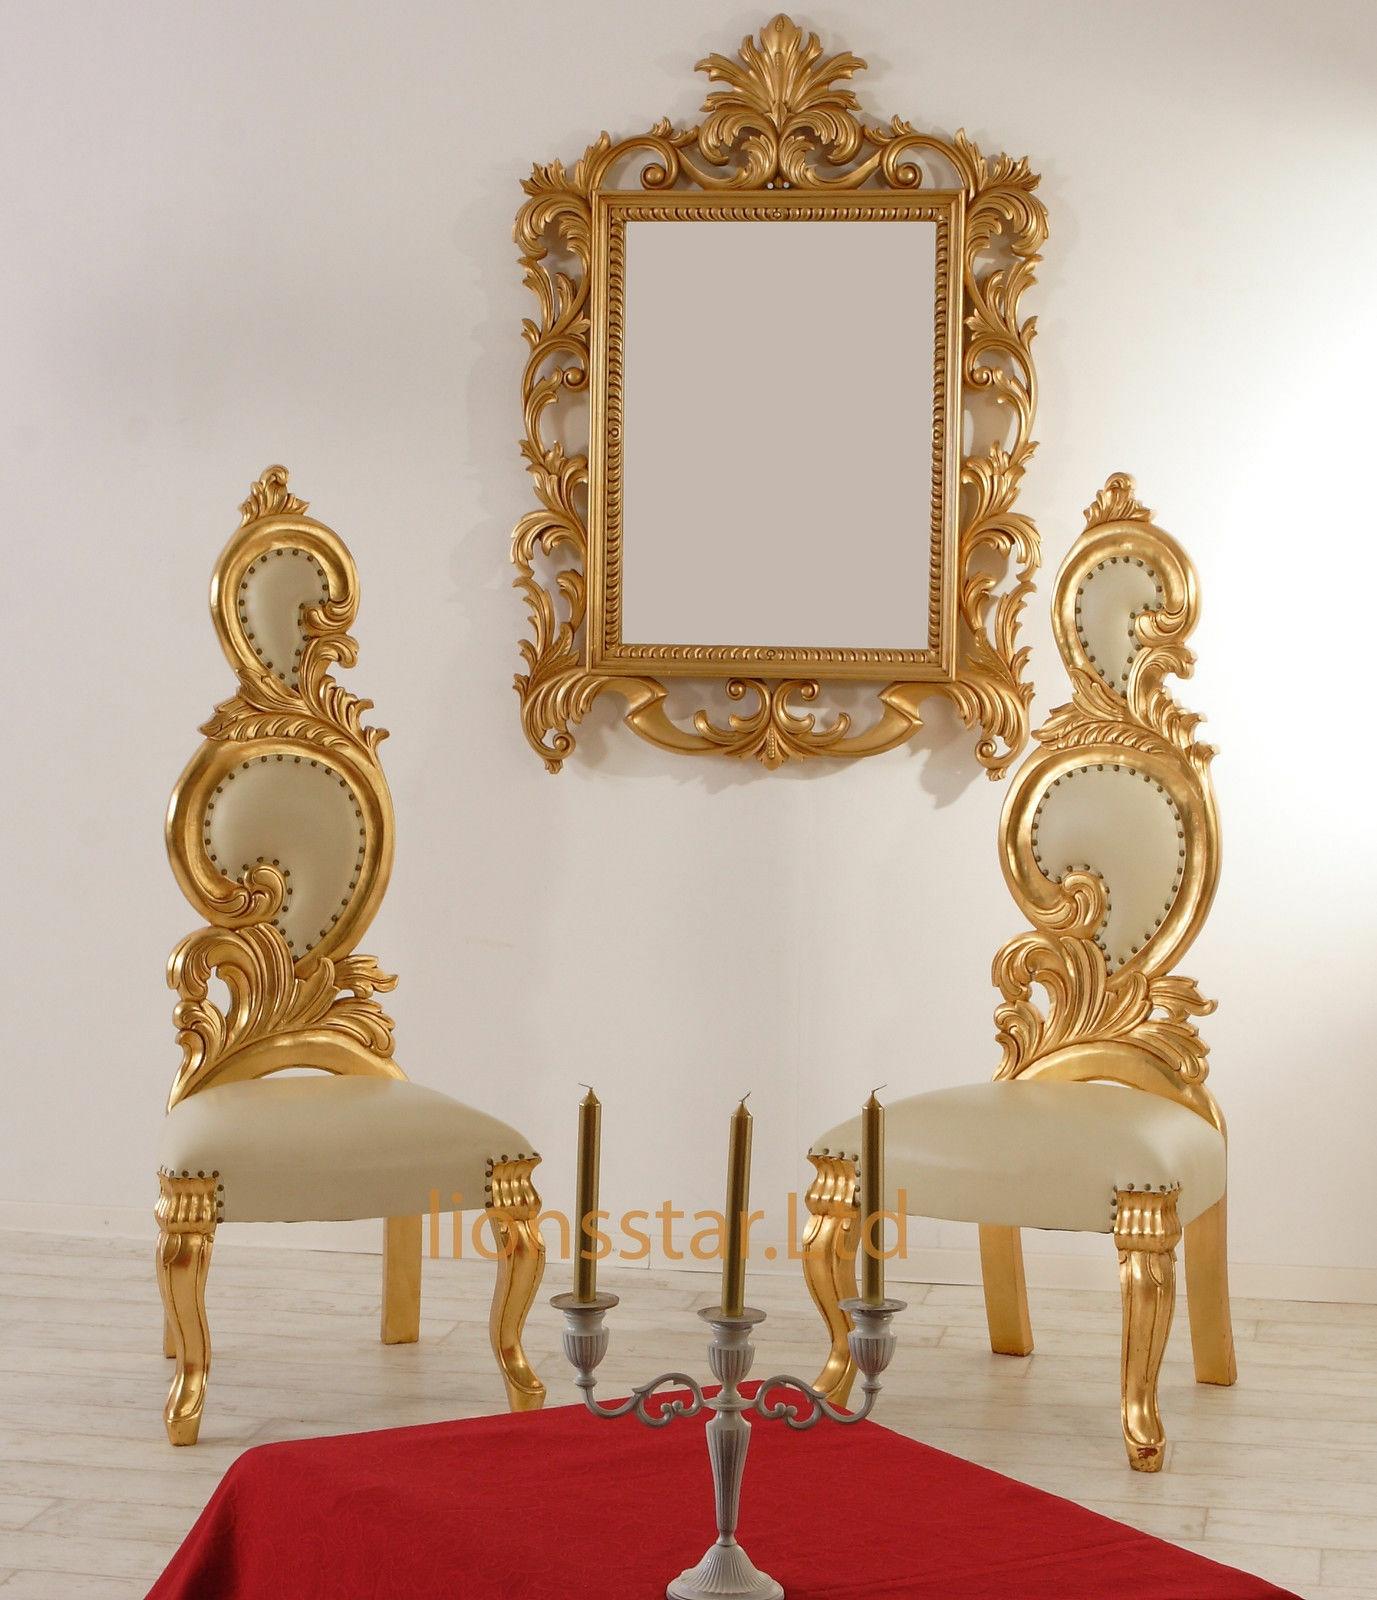 Luxus Stuhl Barock Mahagoni Gold Rose